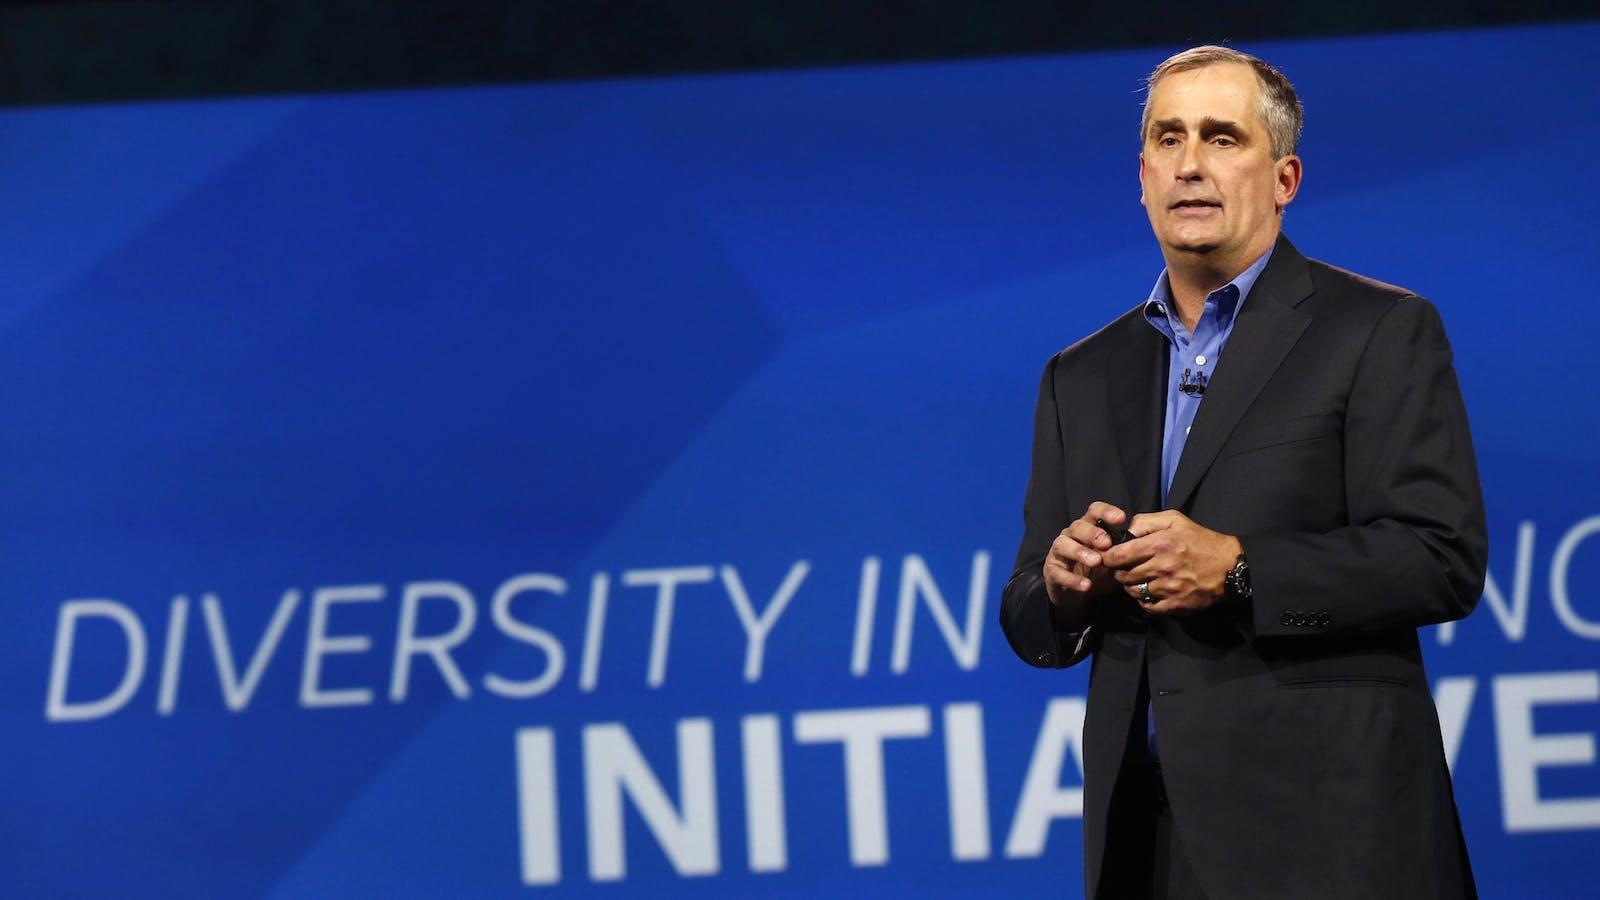 Intel CEO Brian Krzanich. Photo by Bloomberg